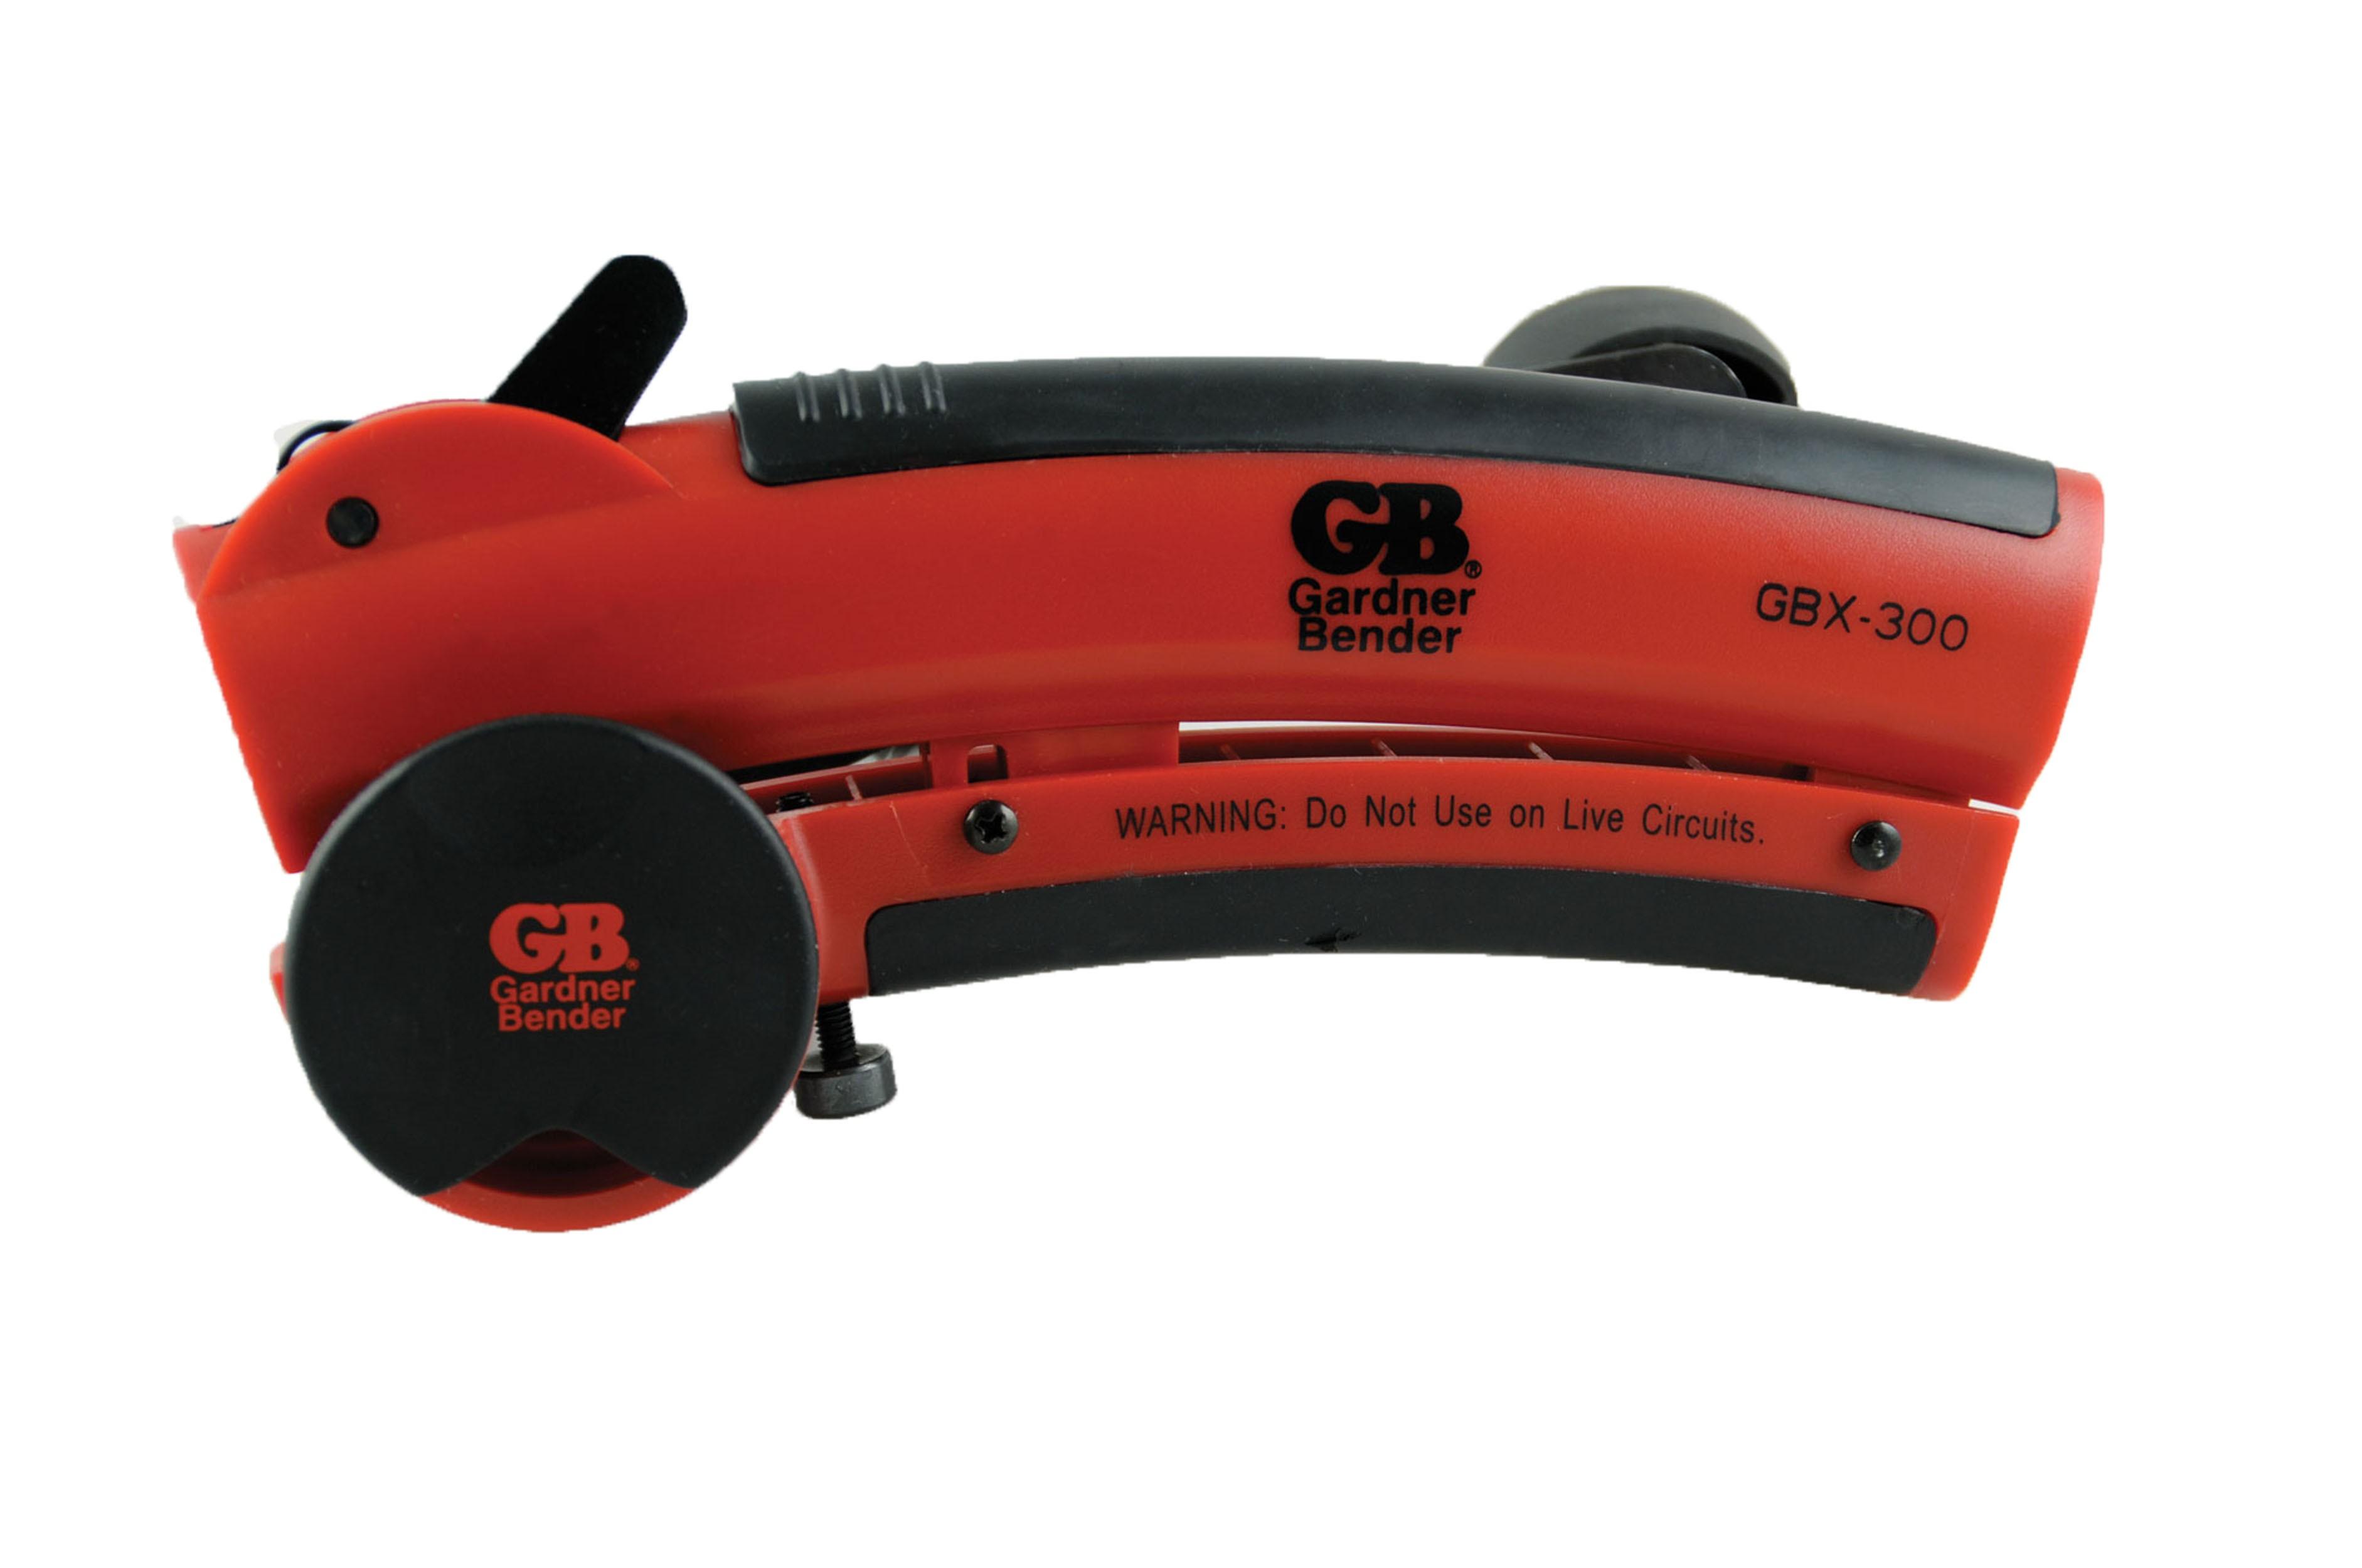 Gardner Bender GBX-300 BX Armor Cable Cutter